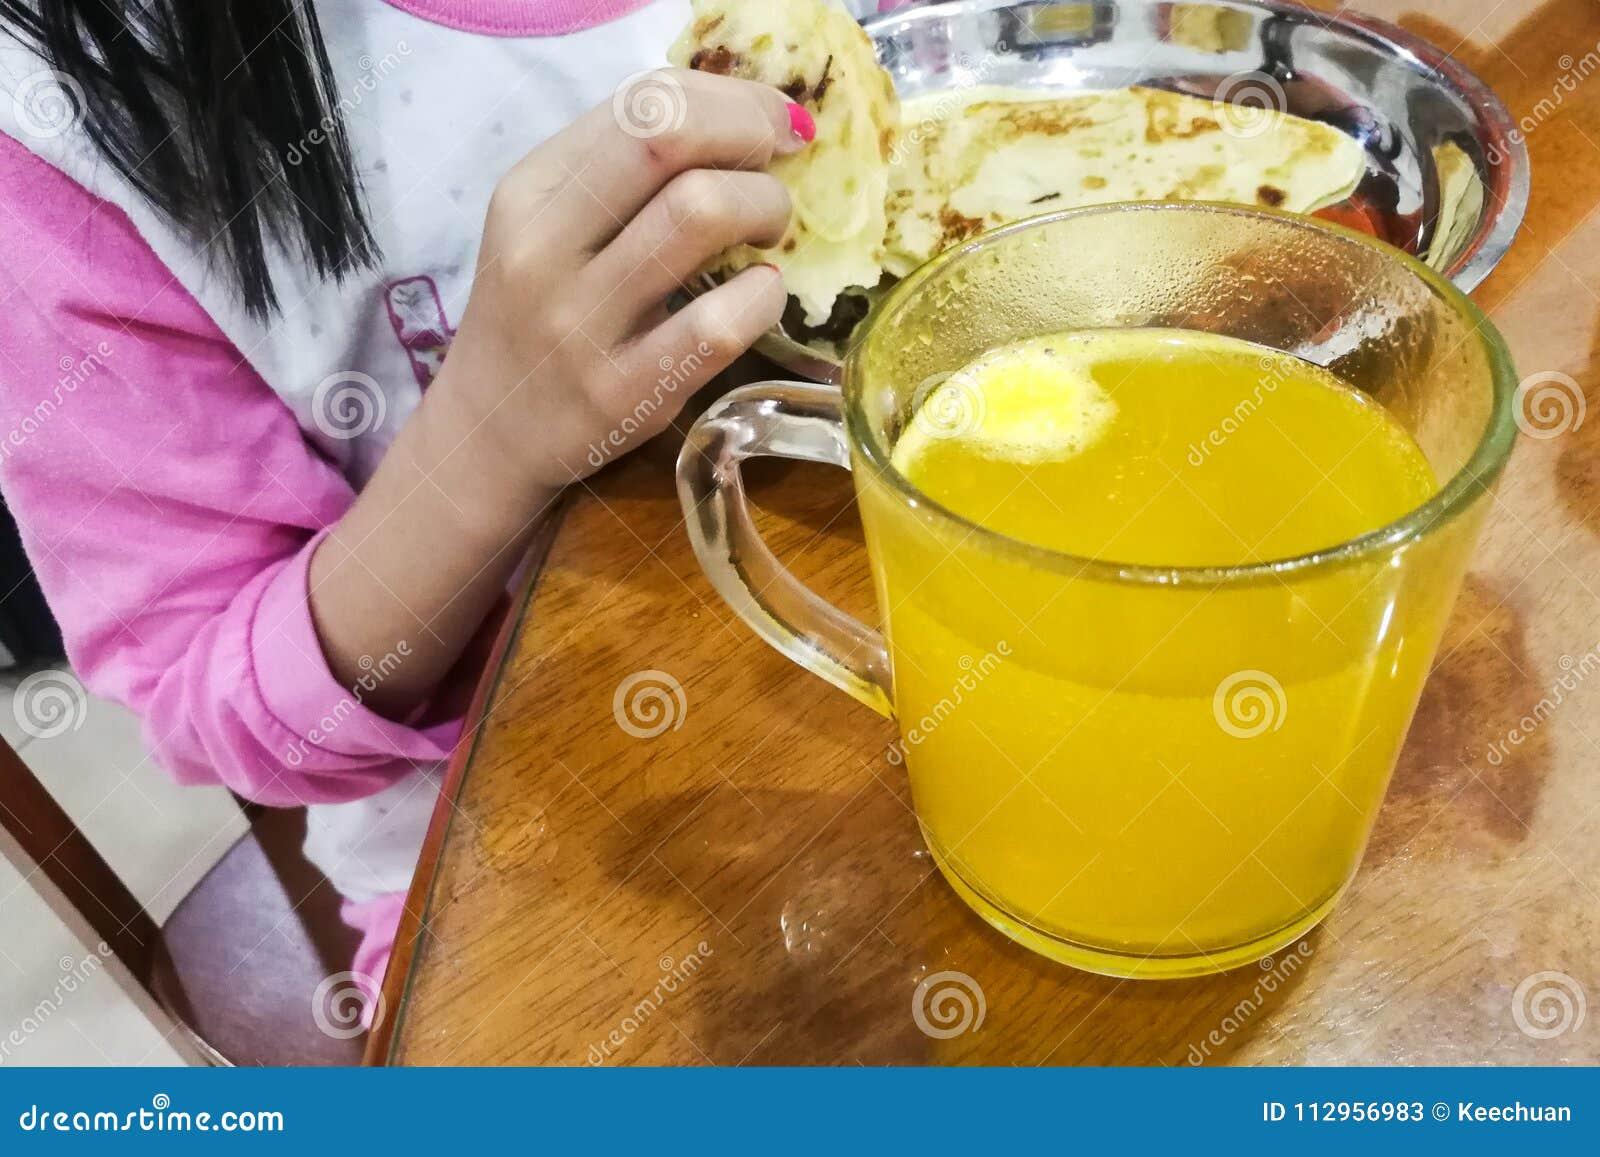 Kid having breakfast with glass of effervescent Vitamin C tablet